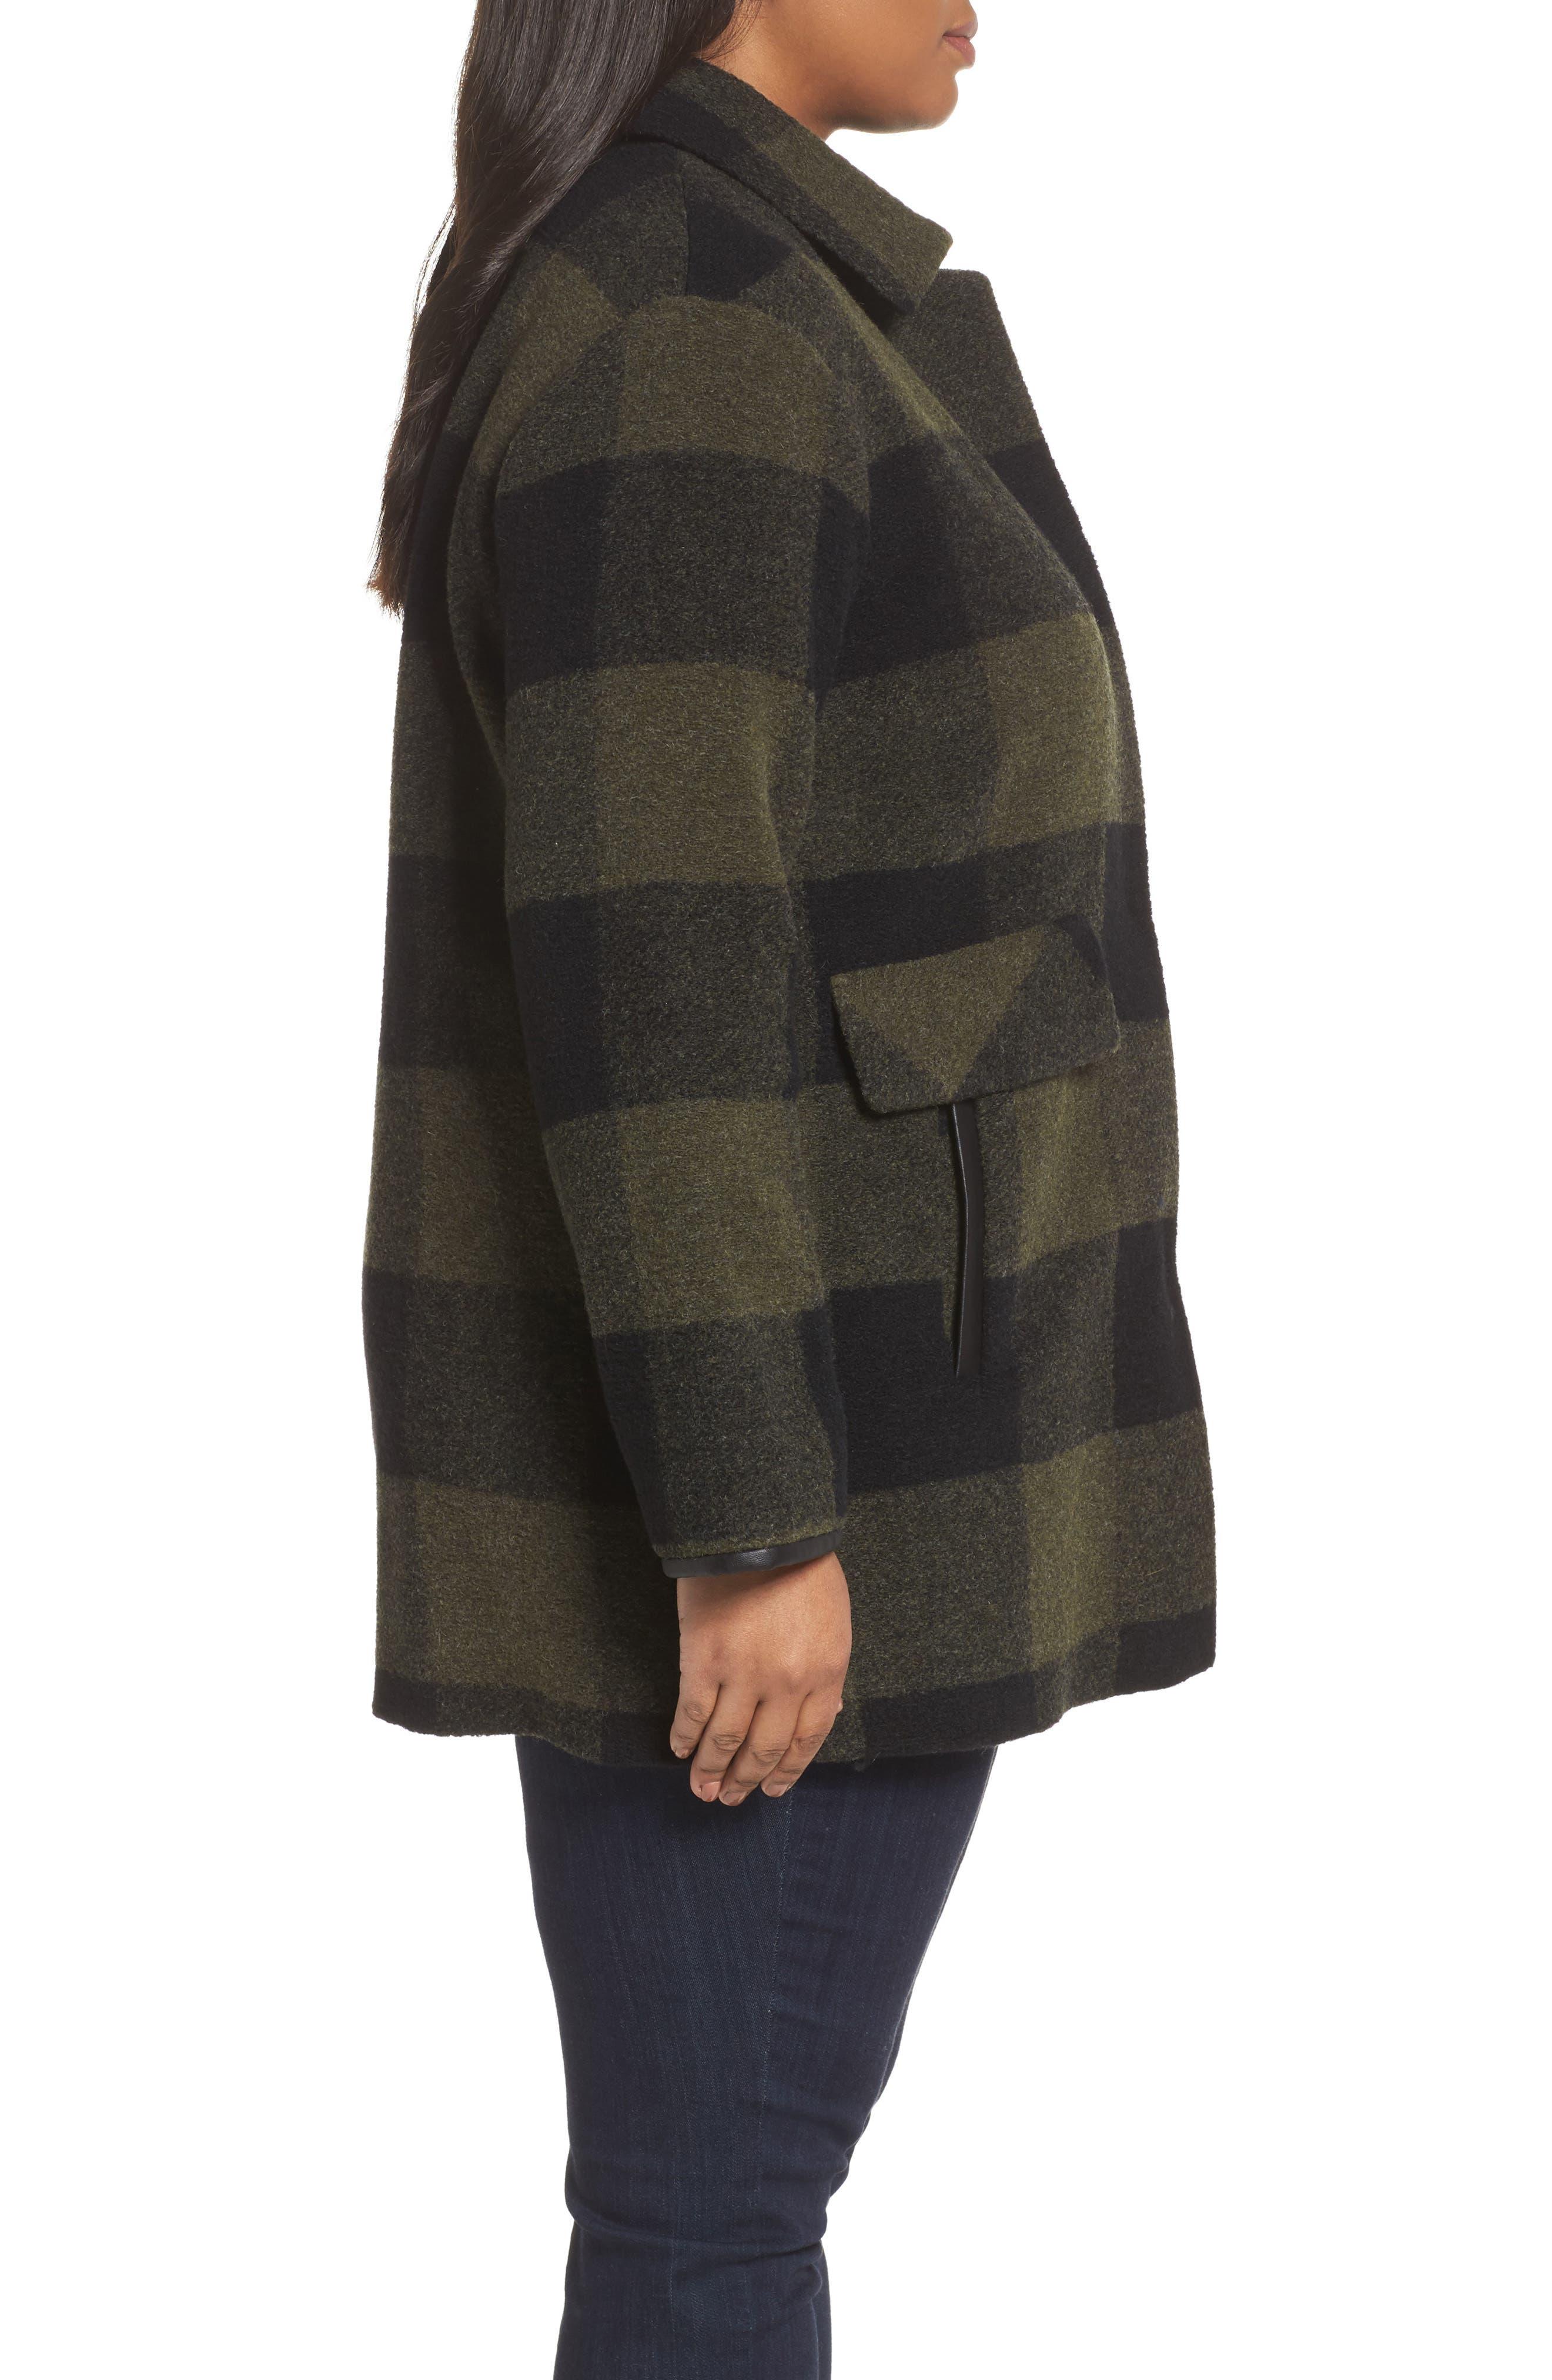 Paul Bunyan Plaid Wool Blend Barn Coat,                             Alternate thumbnail 3, color,                             Olive/ Buff